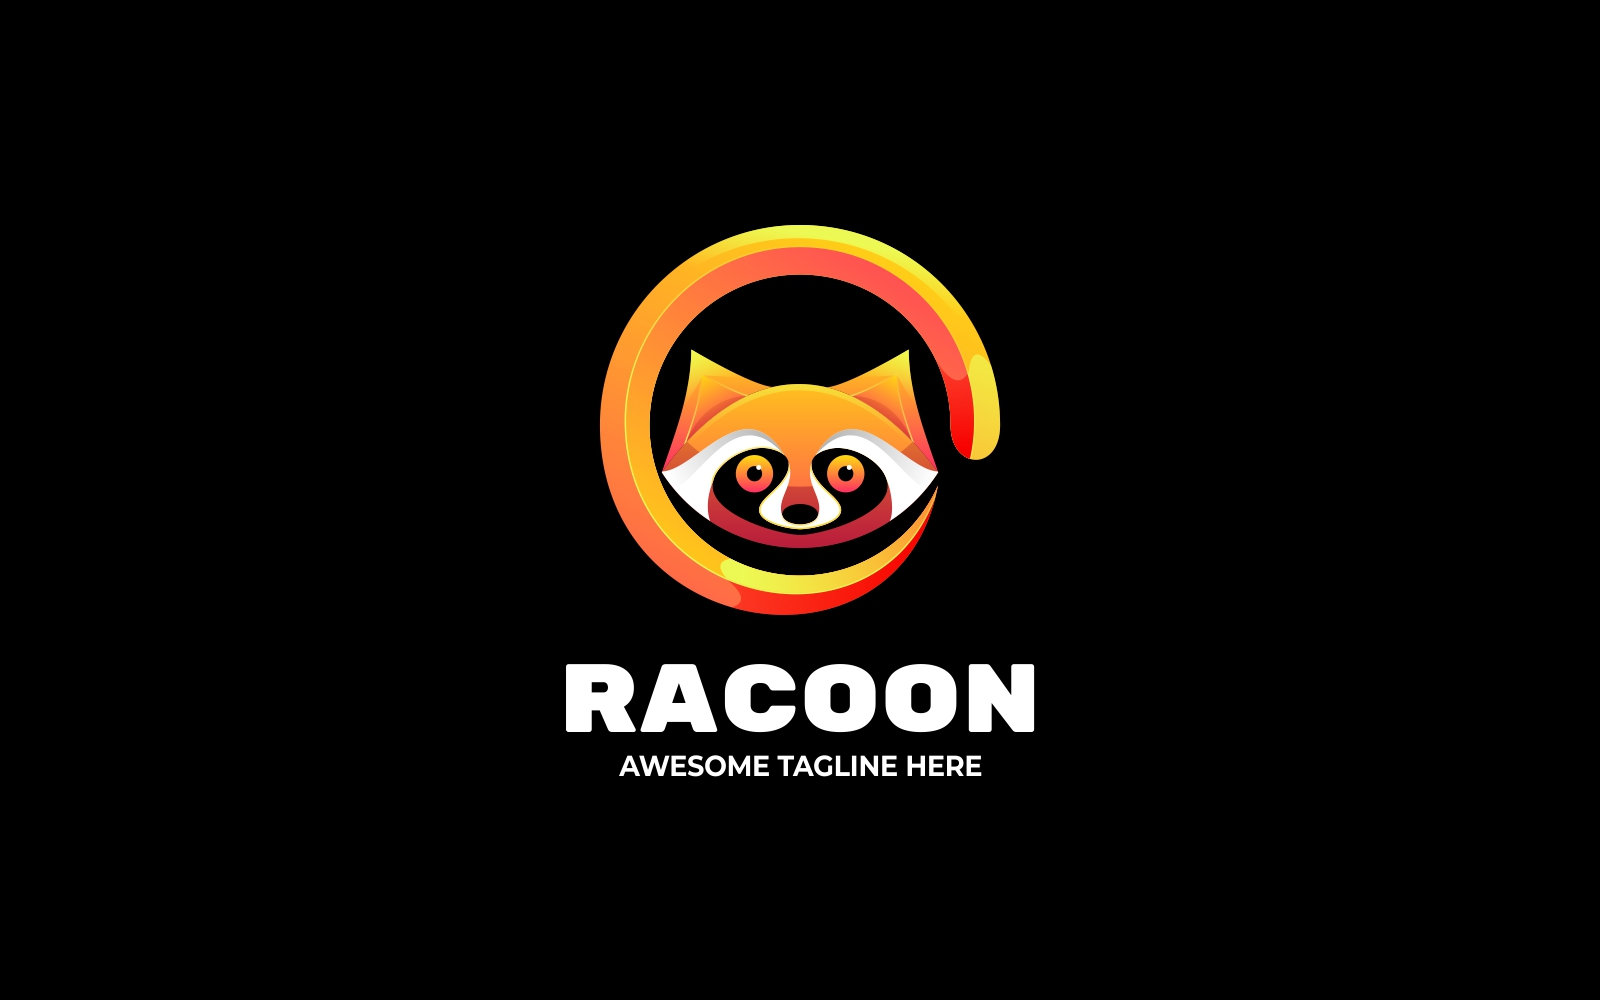 Raccoon in a Circle 3D Gradient Logo